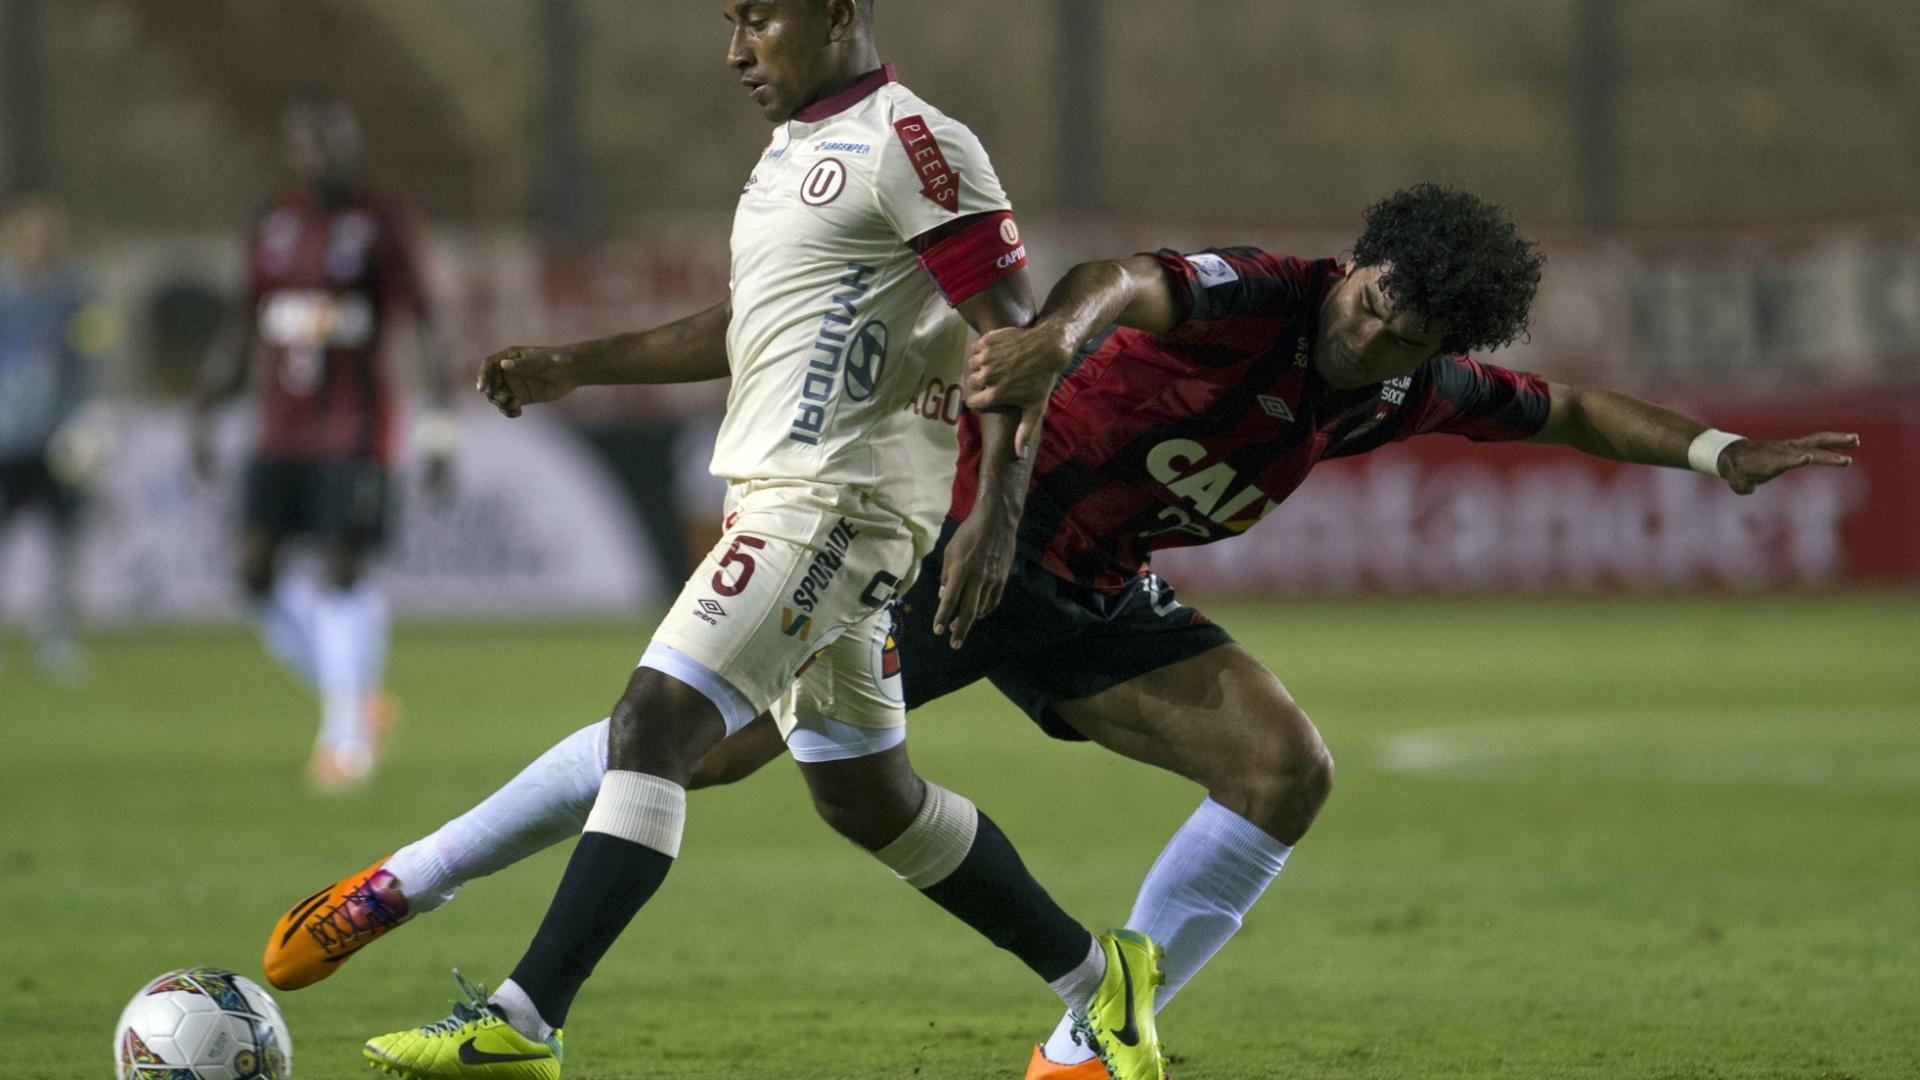 14.03.14 - Bruno Mendes tenta o desarme sobre Antonio Gonzales durante partida entre Atlético-PR e Universitário pela Libertadores